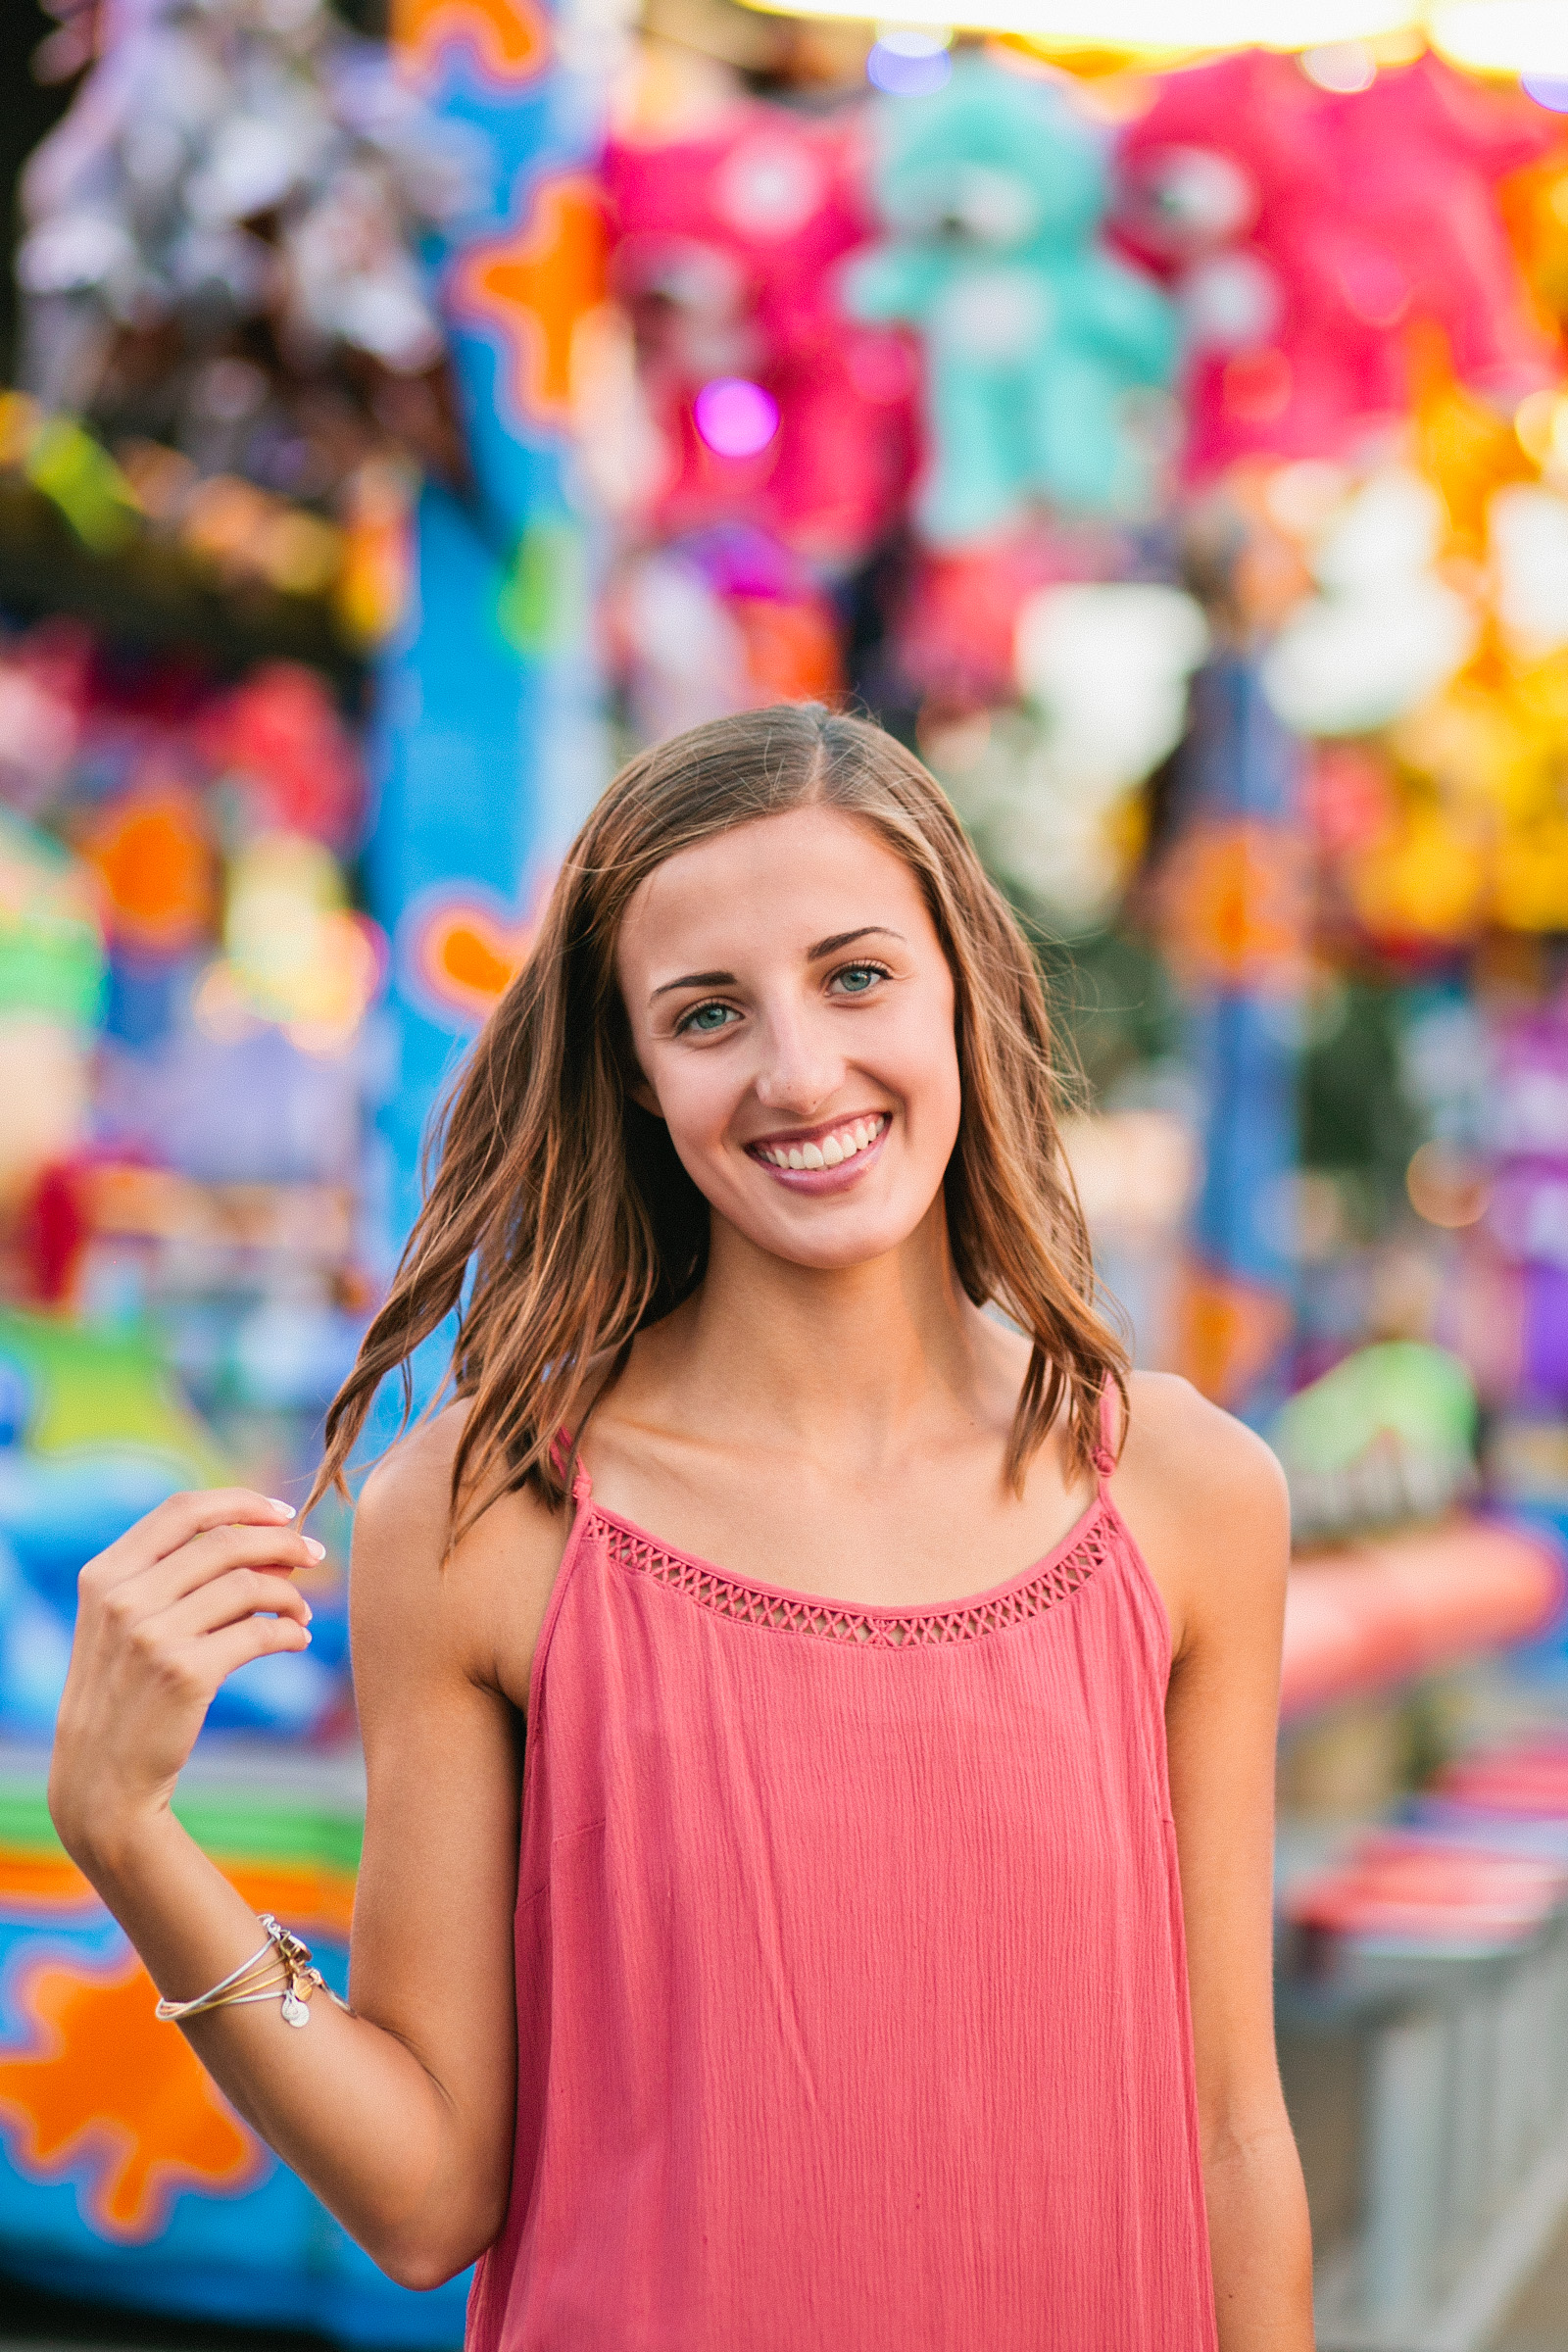 amelia-renee-photography-iowa-state-fair-senior-photos-10.jpg girl in pink dress at iowa state fair